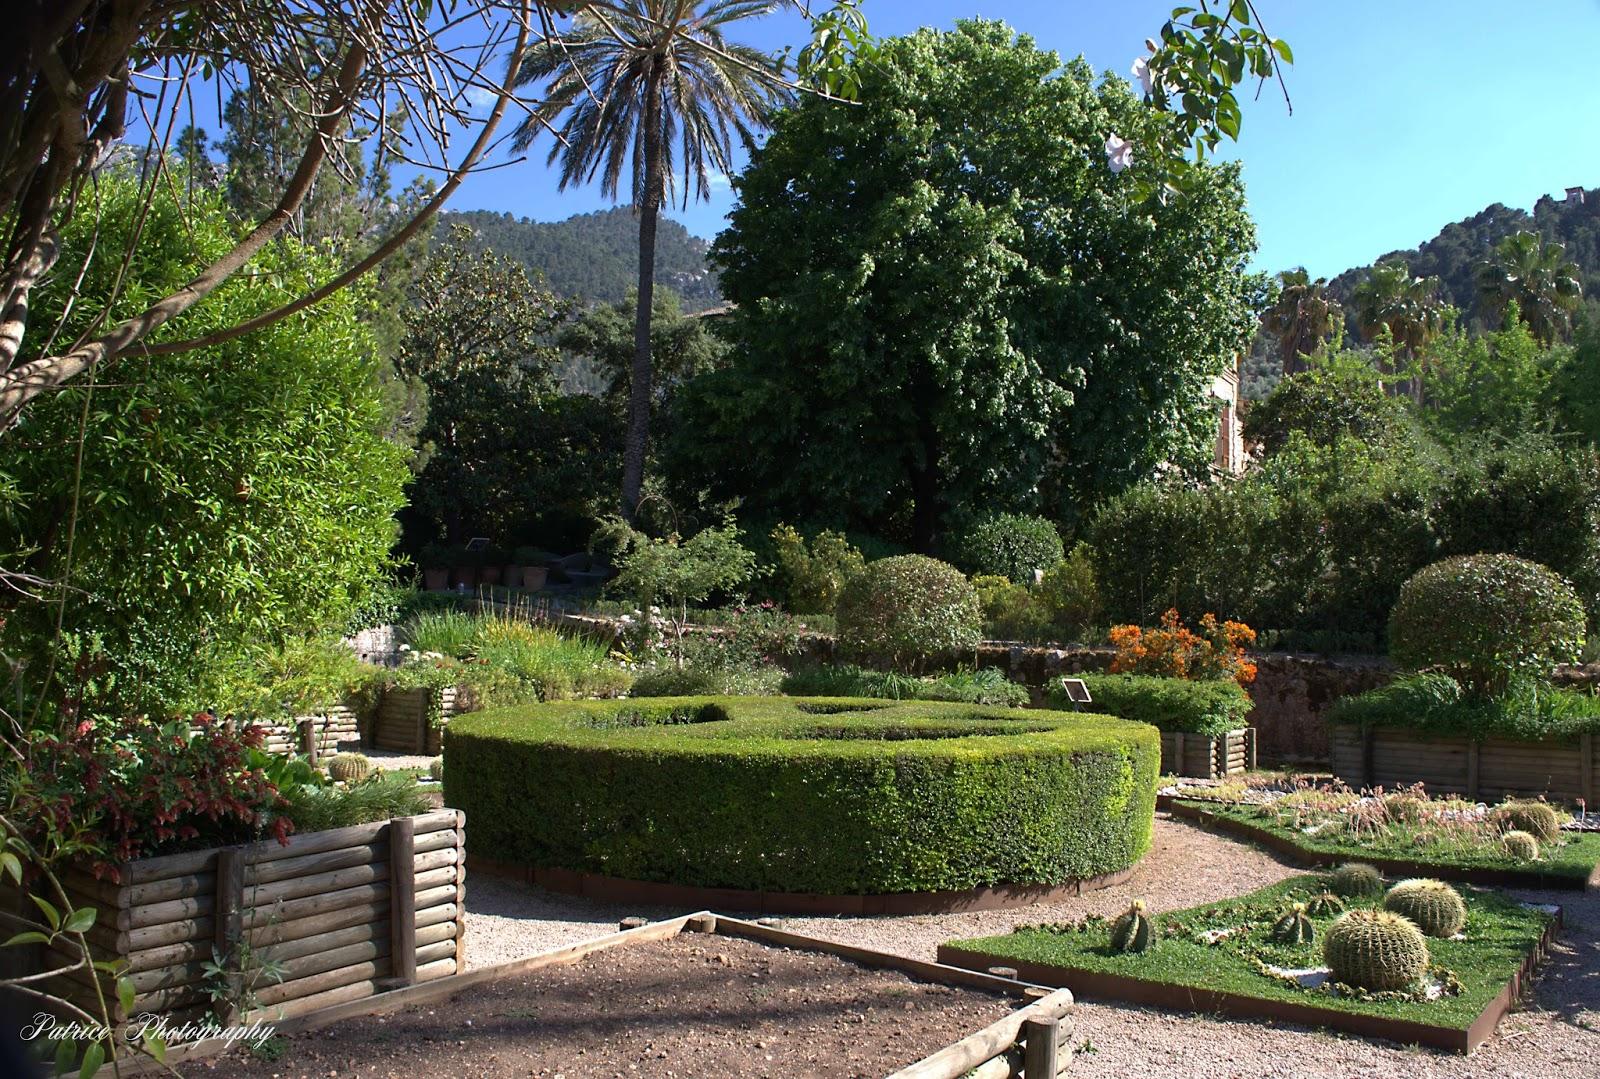 Mallorca jard n bot nico de s ller for Jardin botanico soller